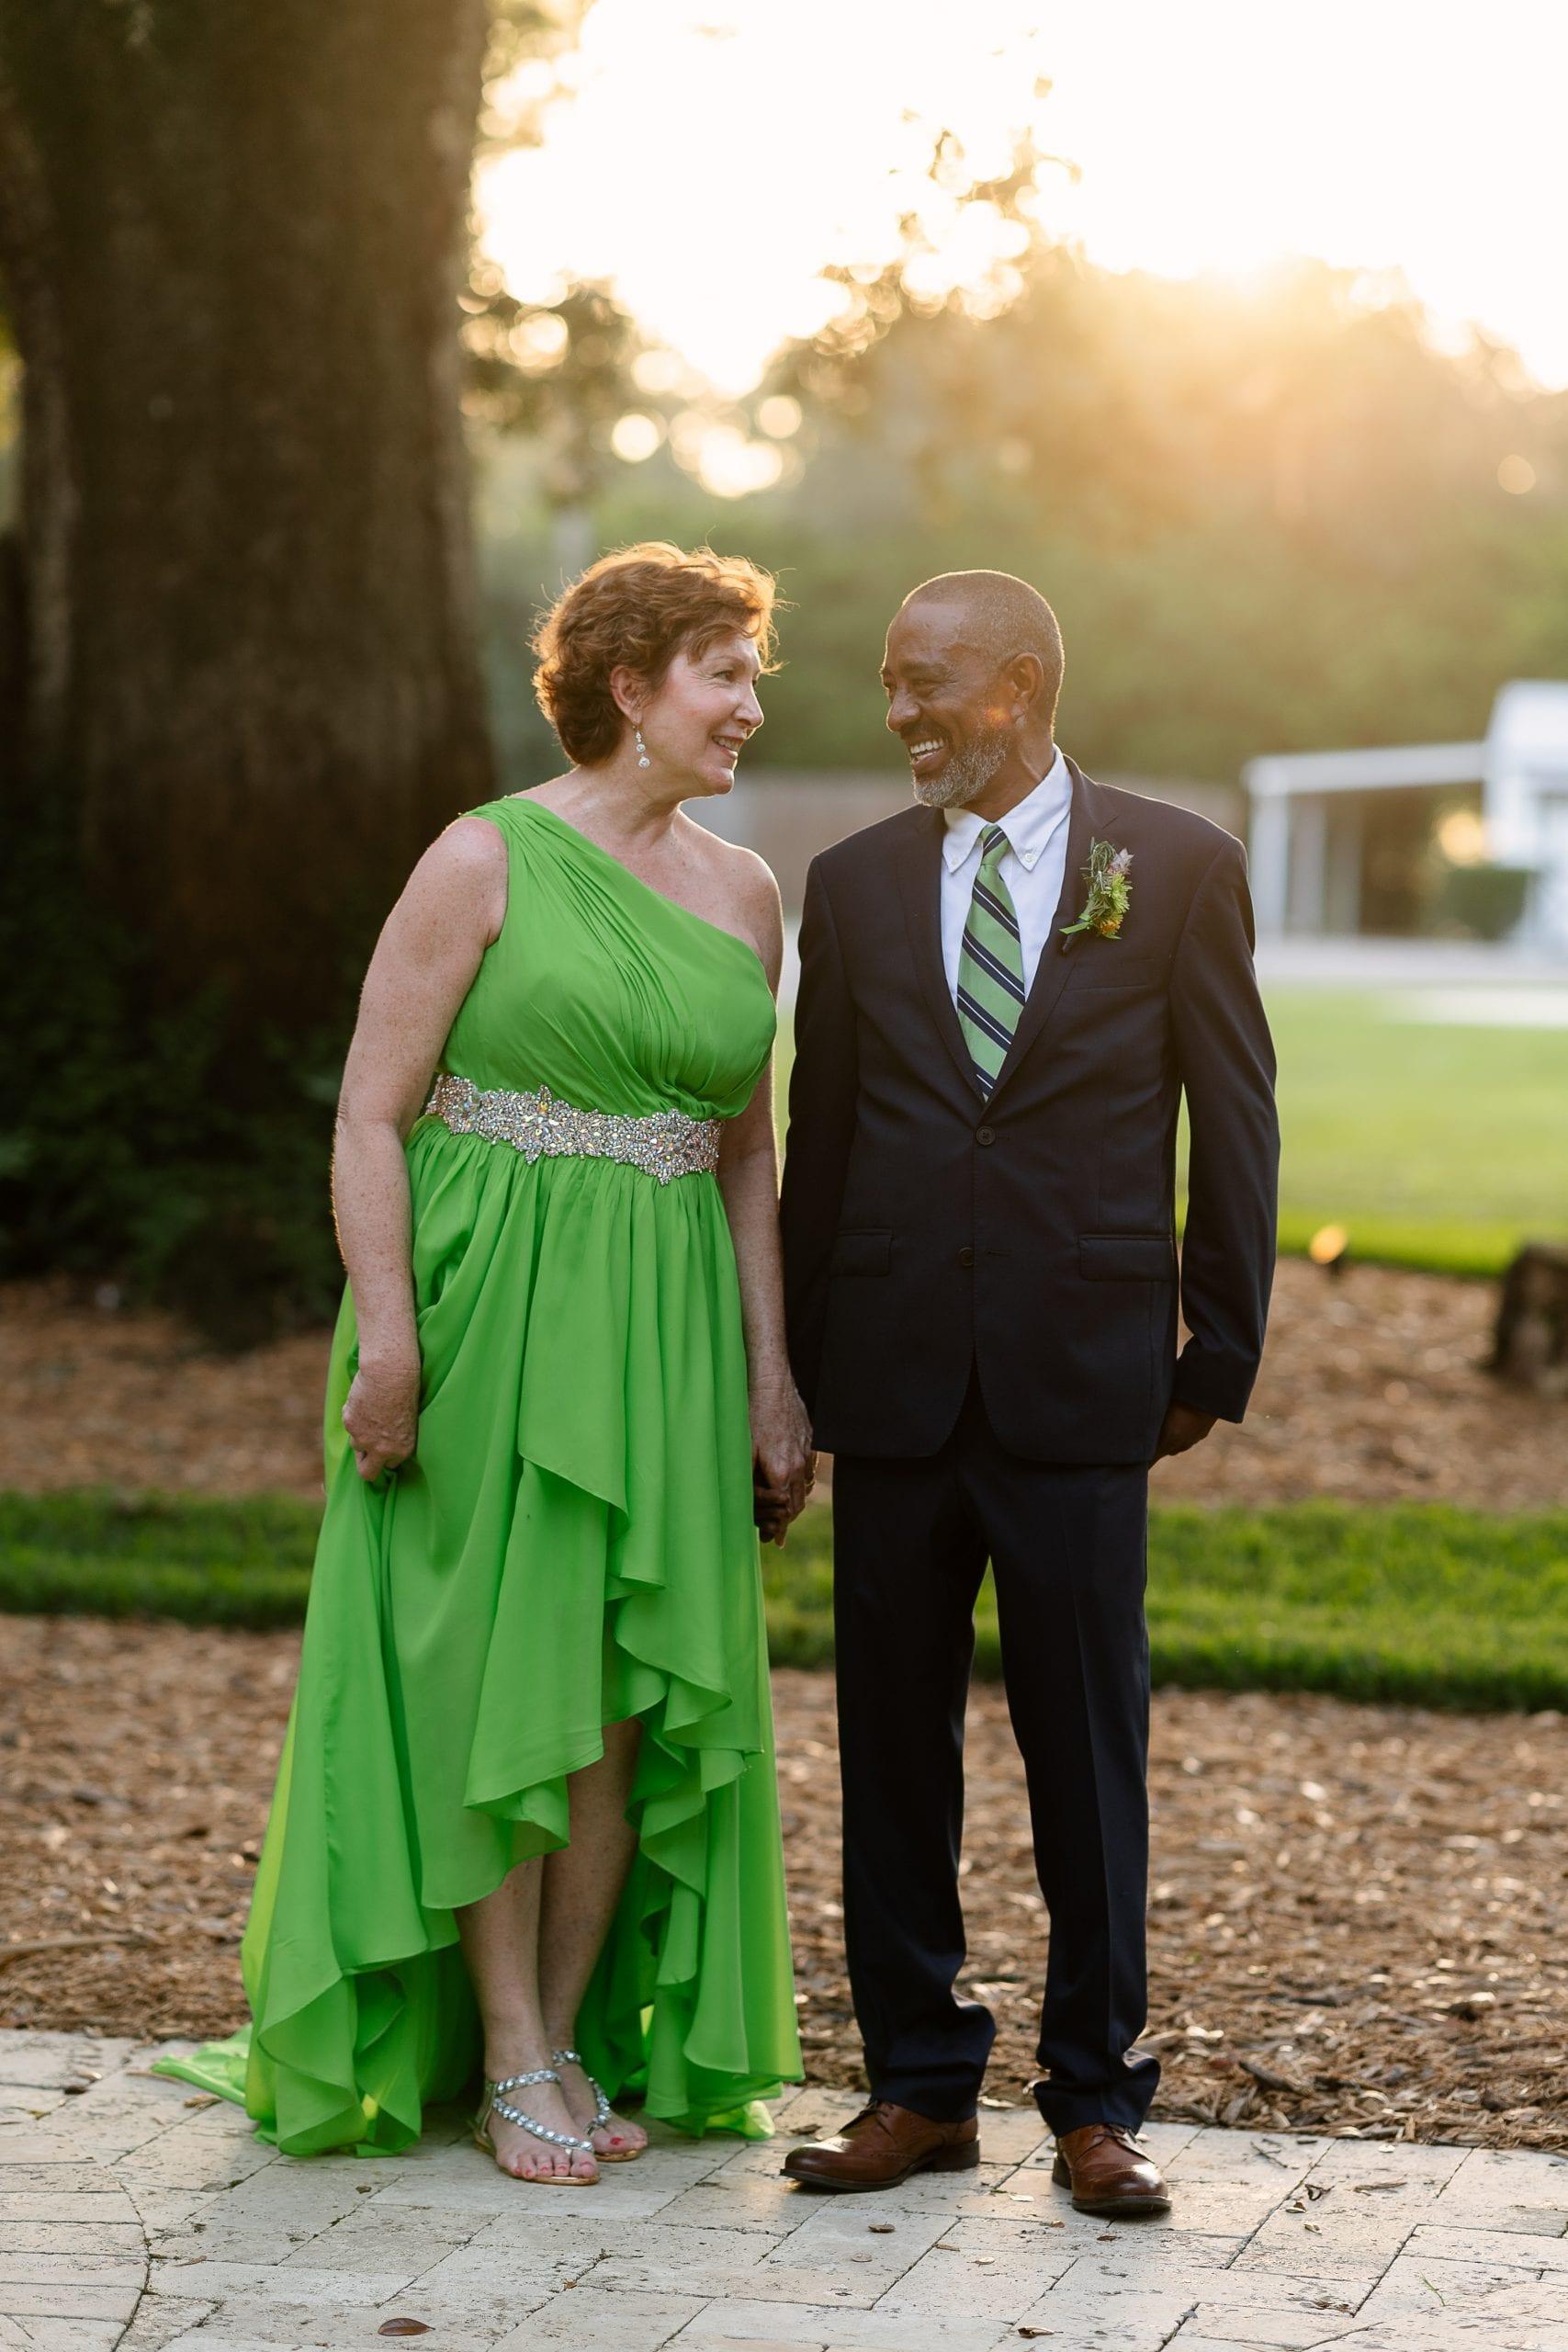 Rita + Daniel's Tropical Inspired Wedding